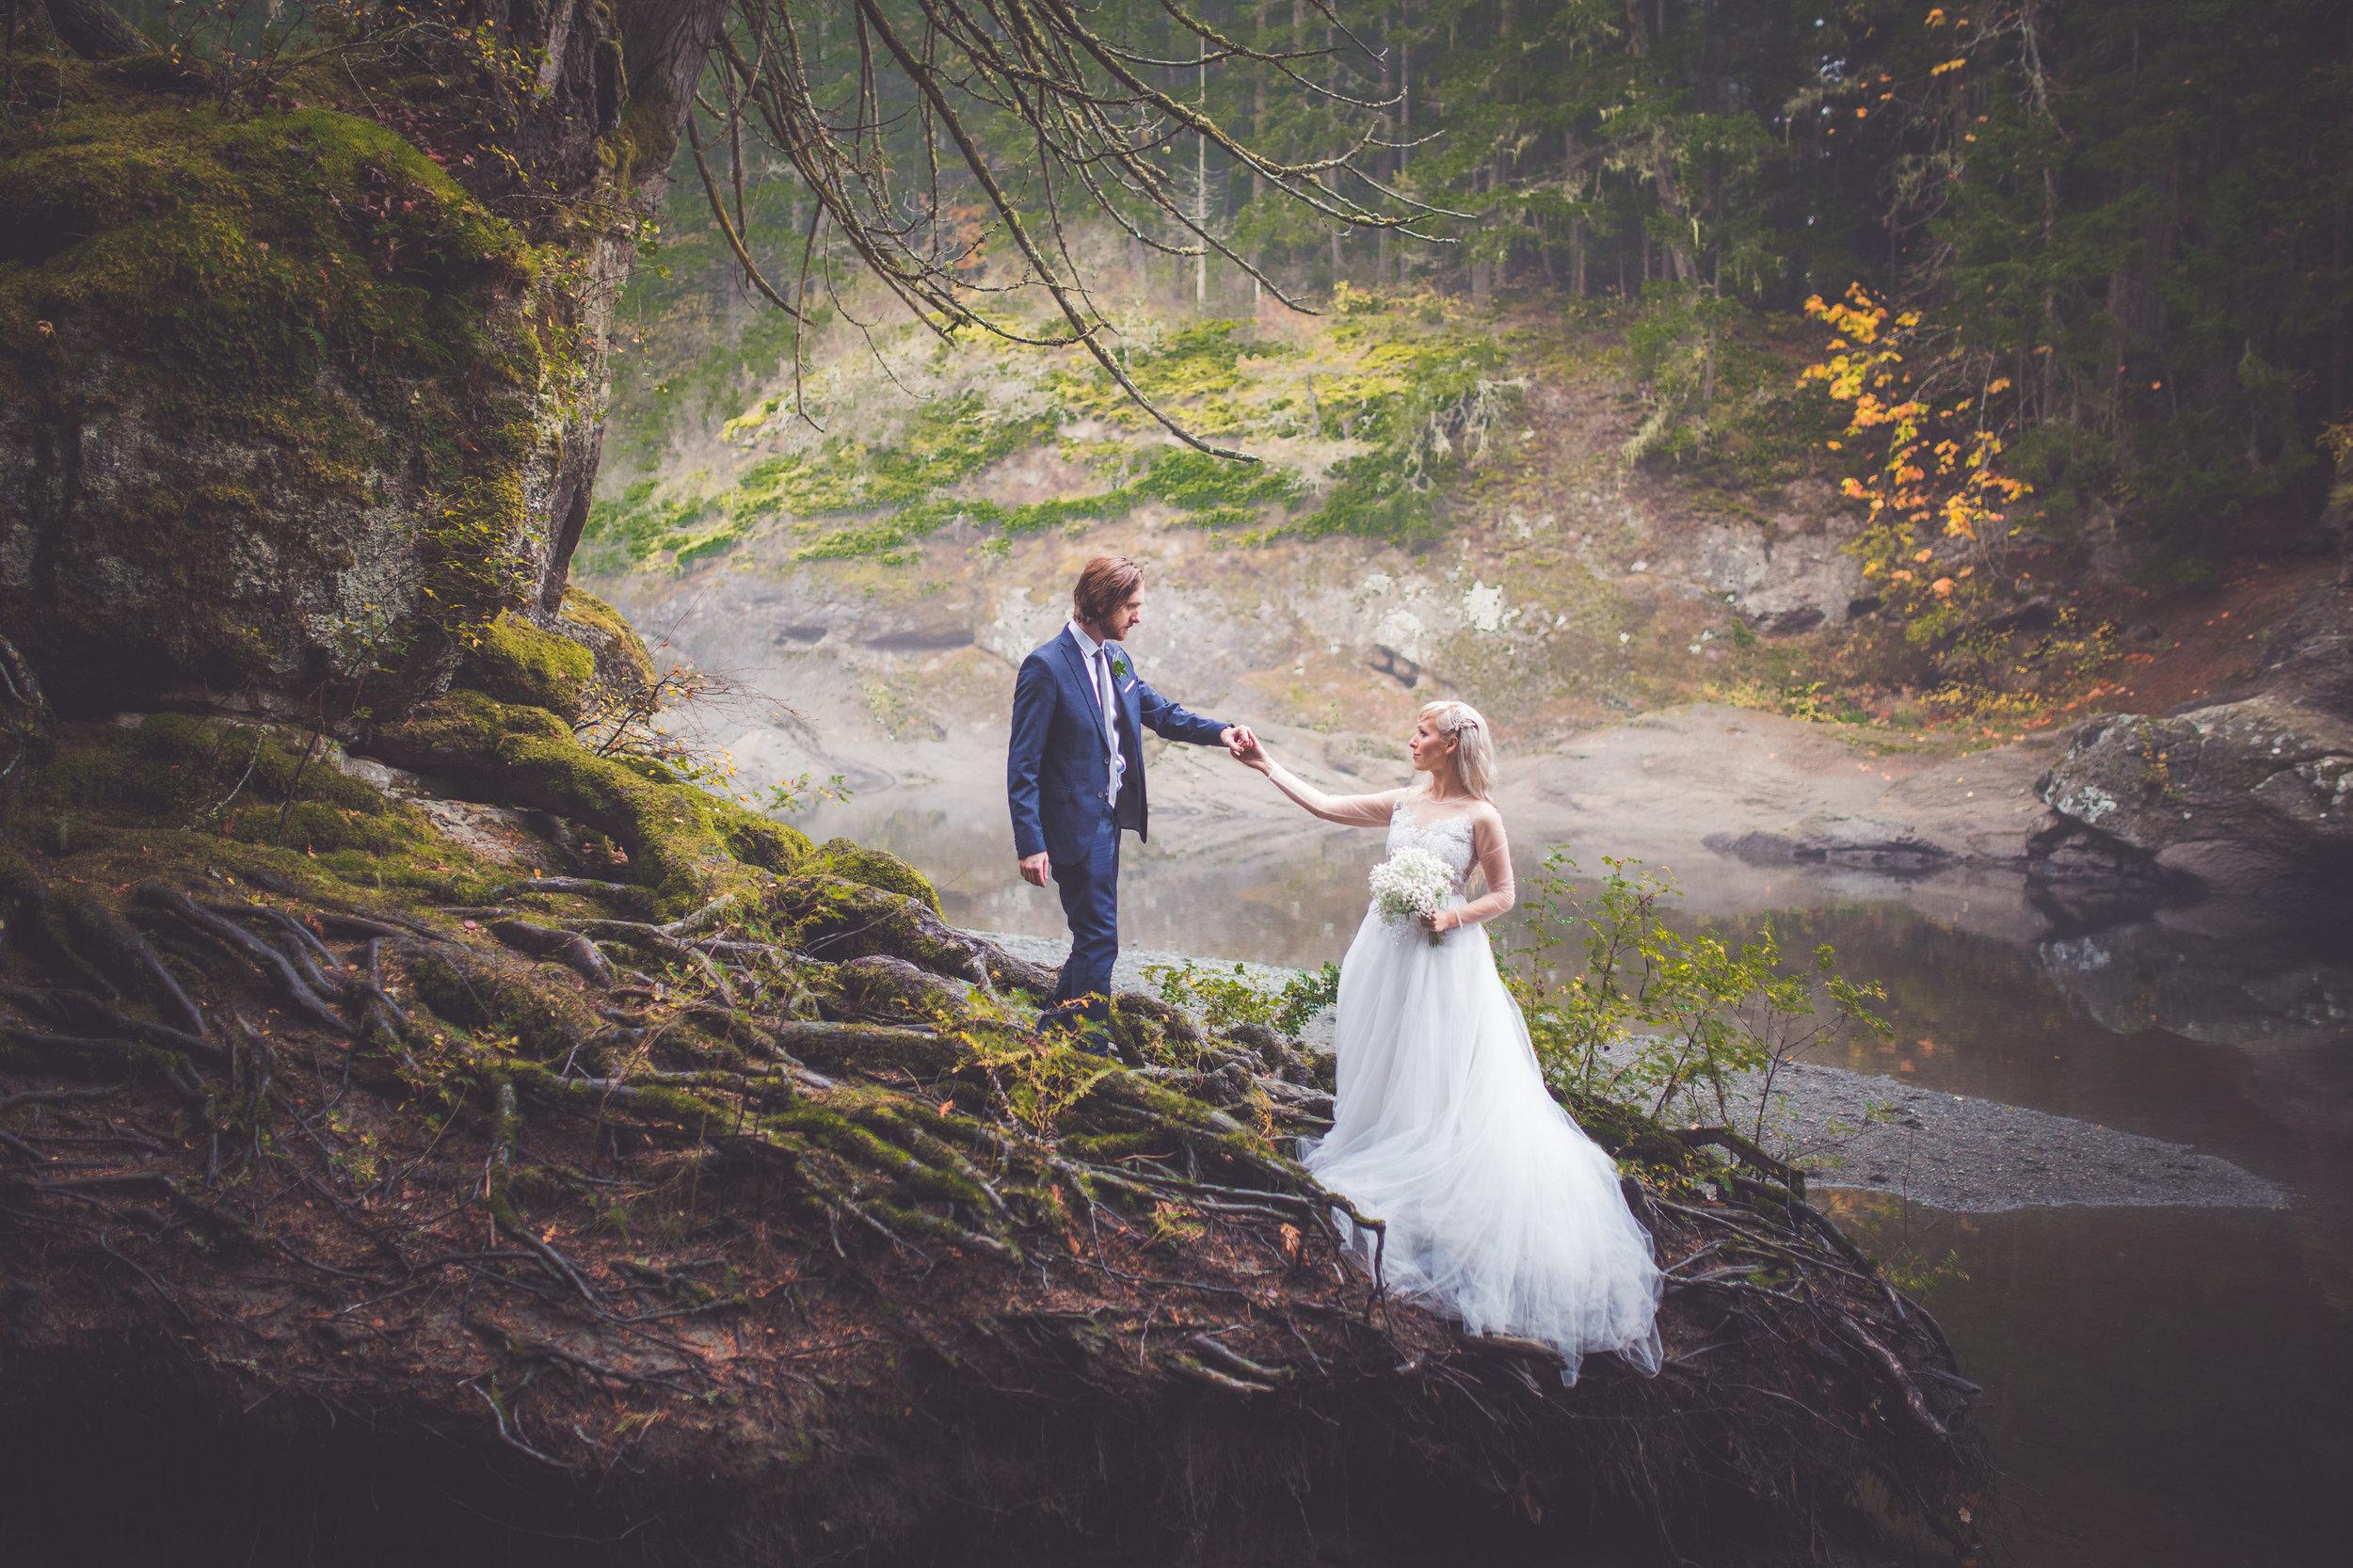 whimsical-romantic-wedding-top-bridge-46.jpg